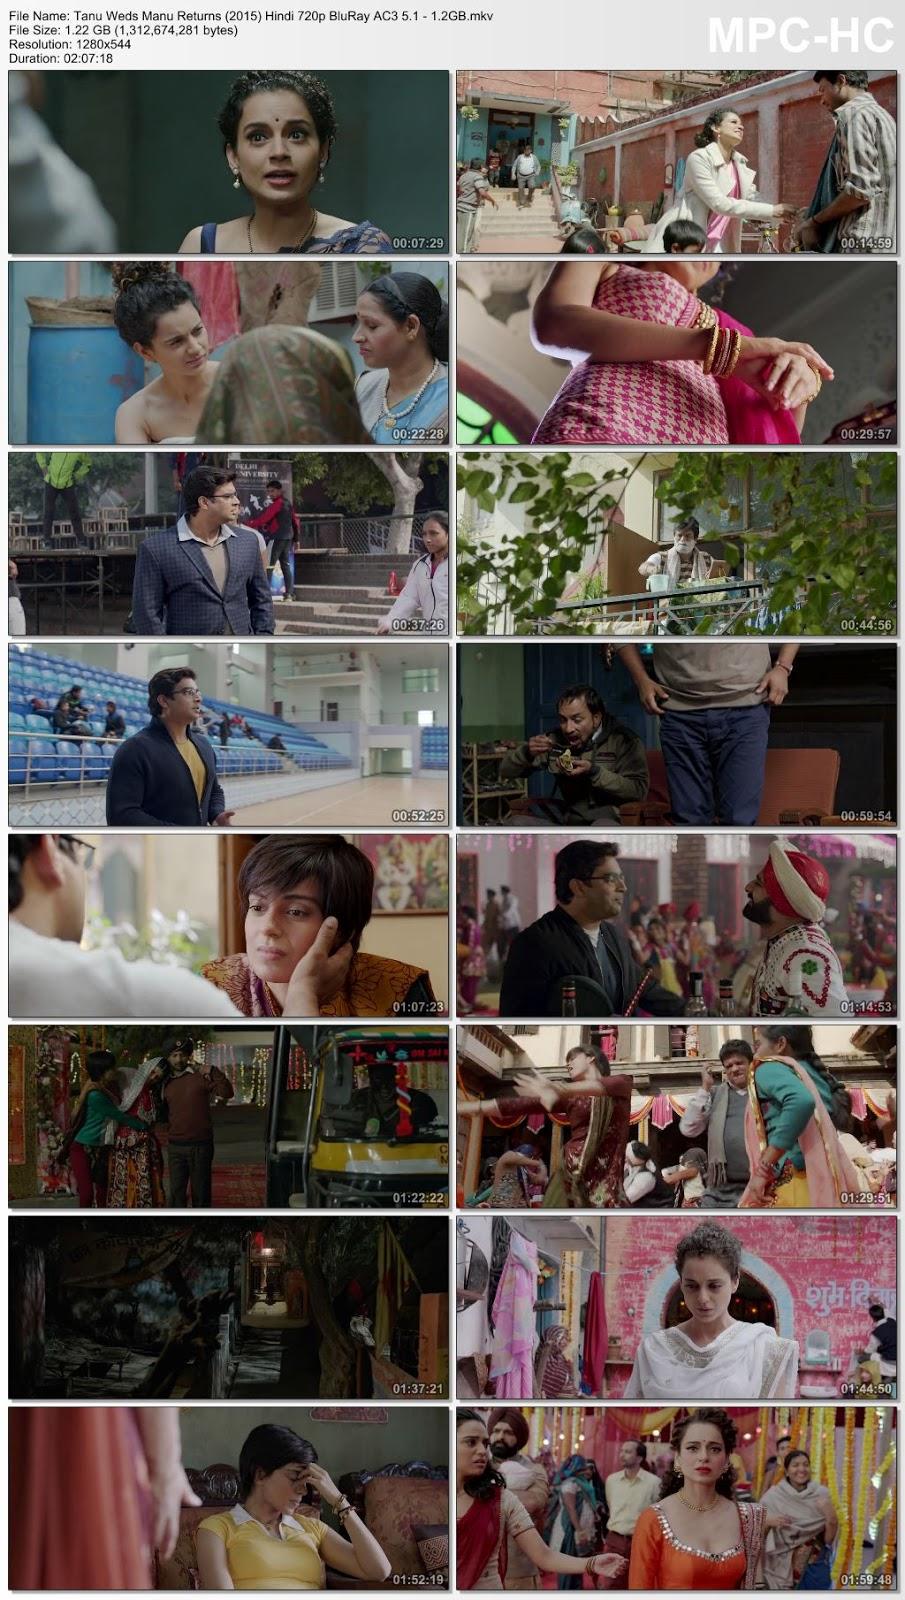 Tanu Weds Manu Returns (2015) Hindi 720p BluRay AC3 5.1 – 1.2GB Desirehub